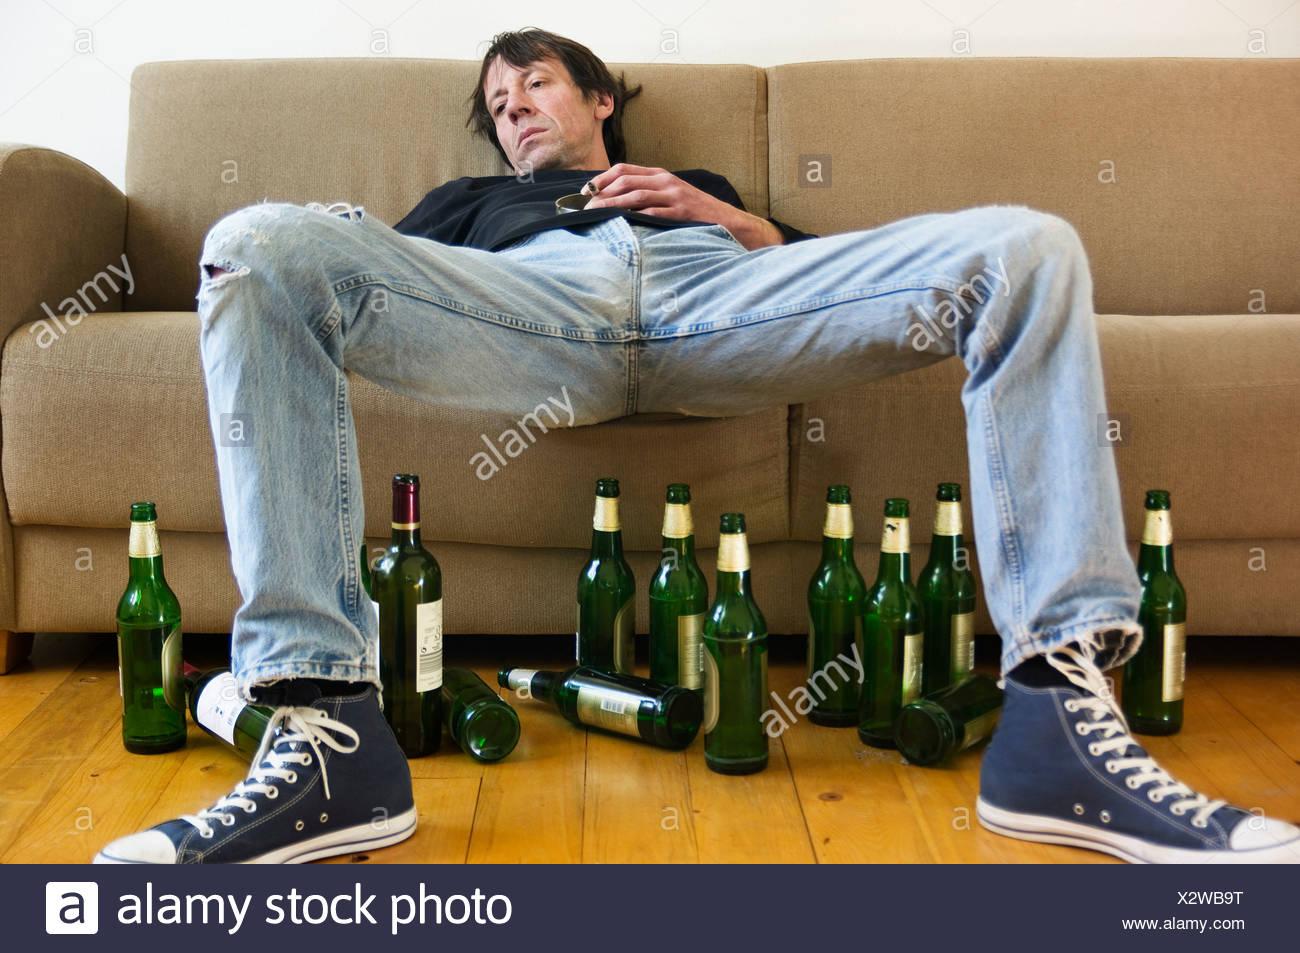 Germany Hessen Frankfurt Drunk Man Lying On Sofa With Empty Beer